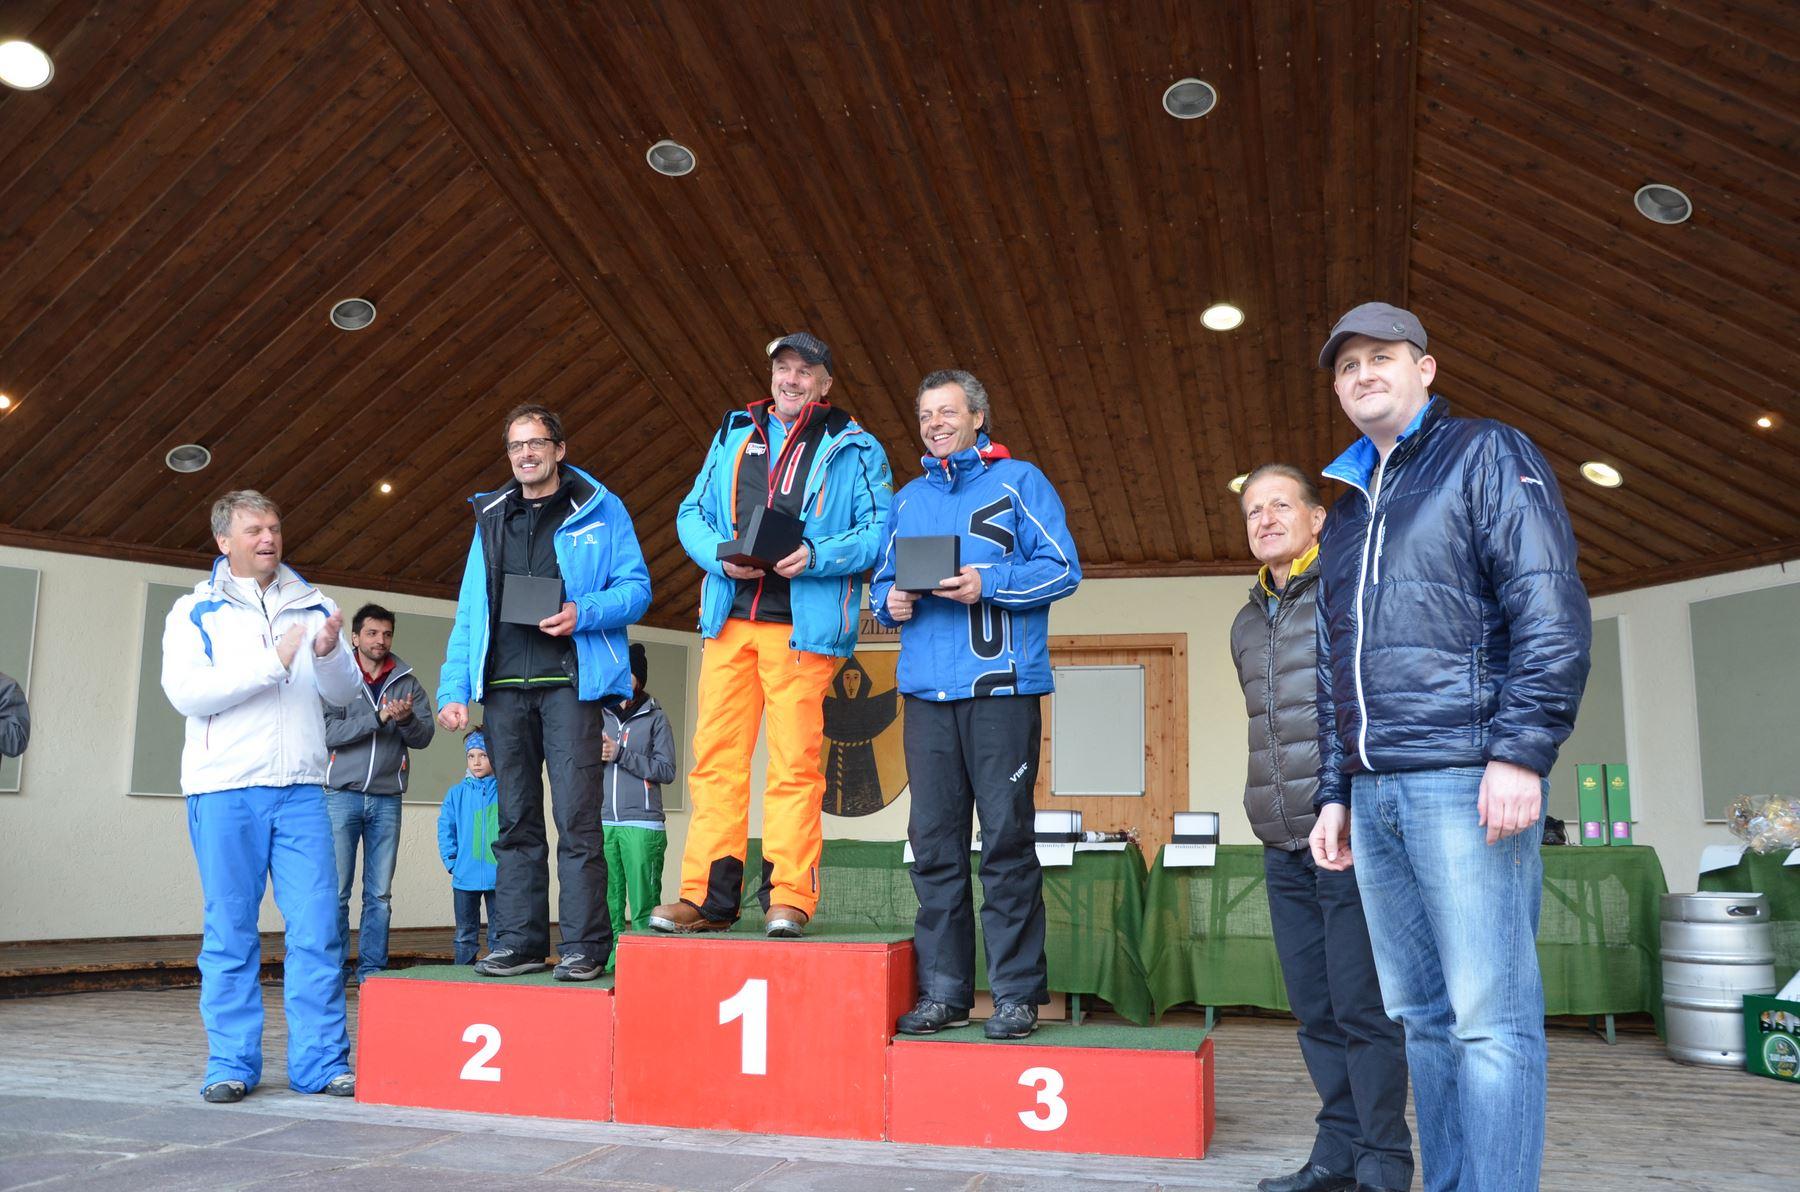 2015-03-22 BV Zillertal Skirennen 439.JPG